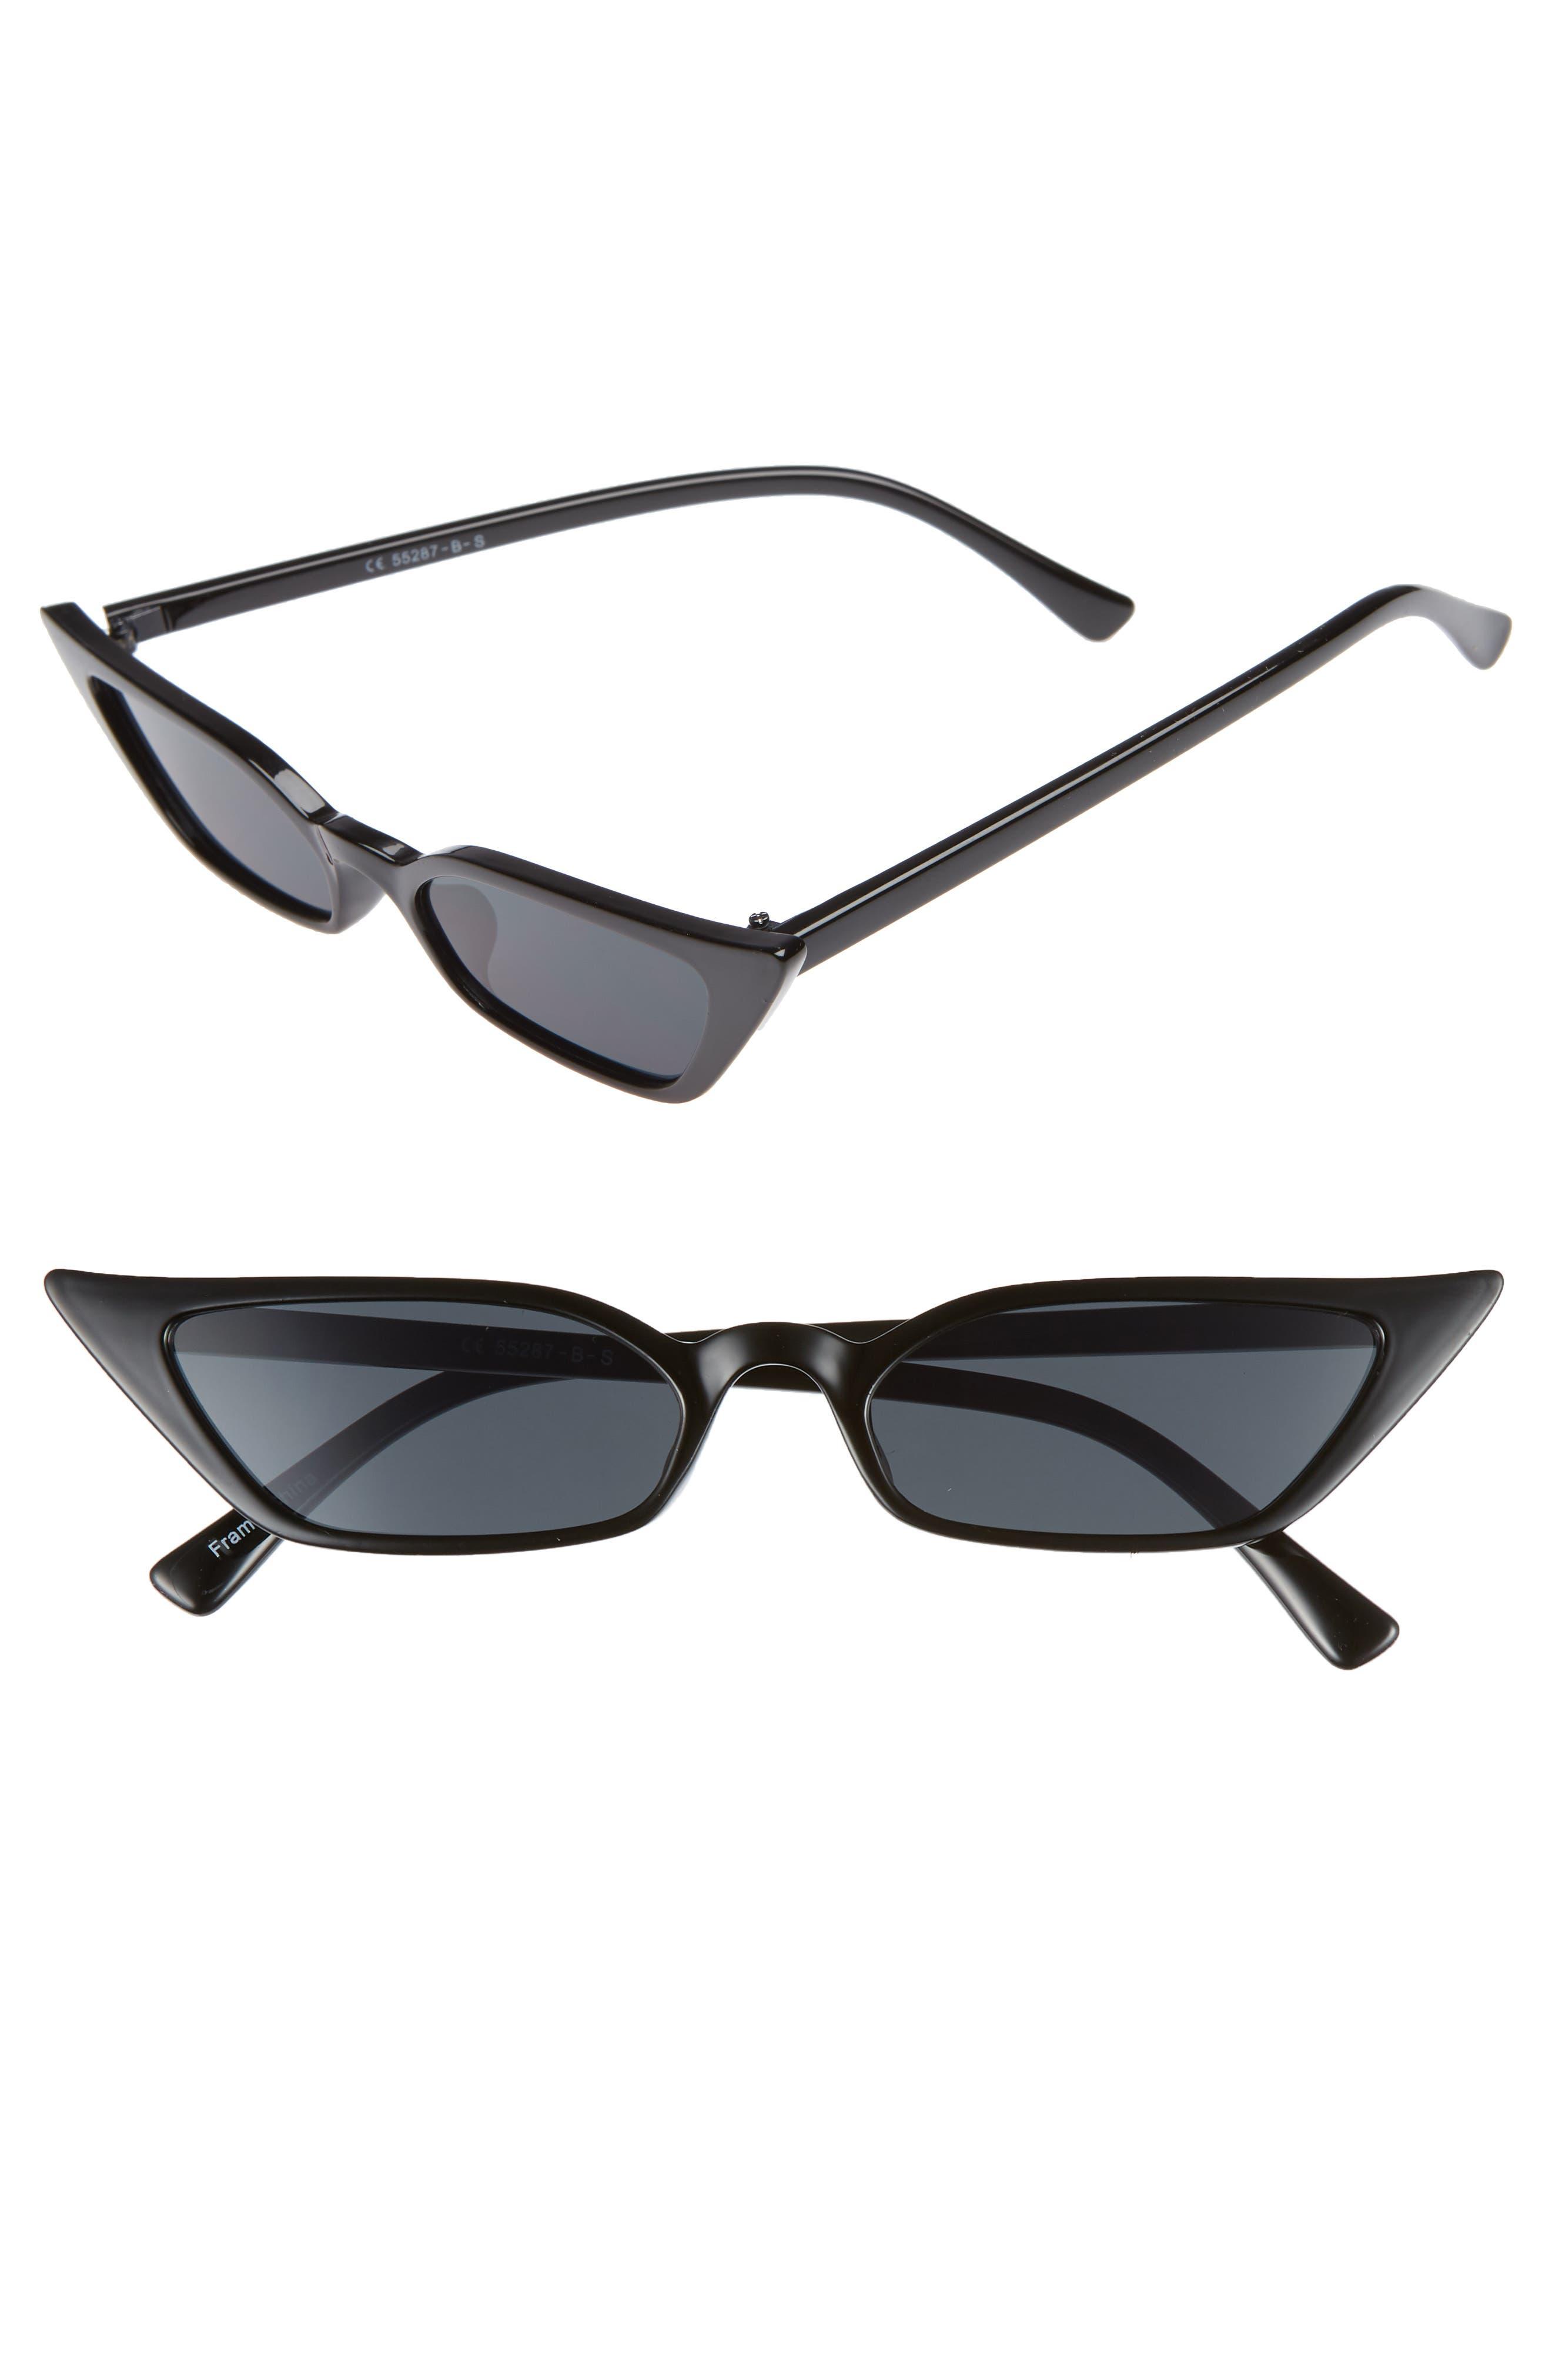 52mm Cat Eye Sunglasses,                         Main,                         color, BLACK/ SMOKE LENS